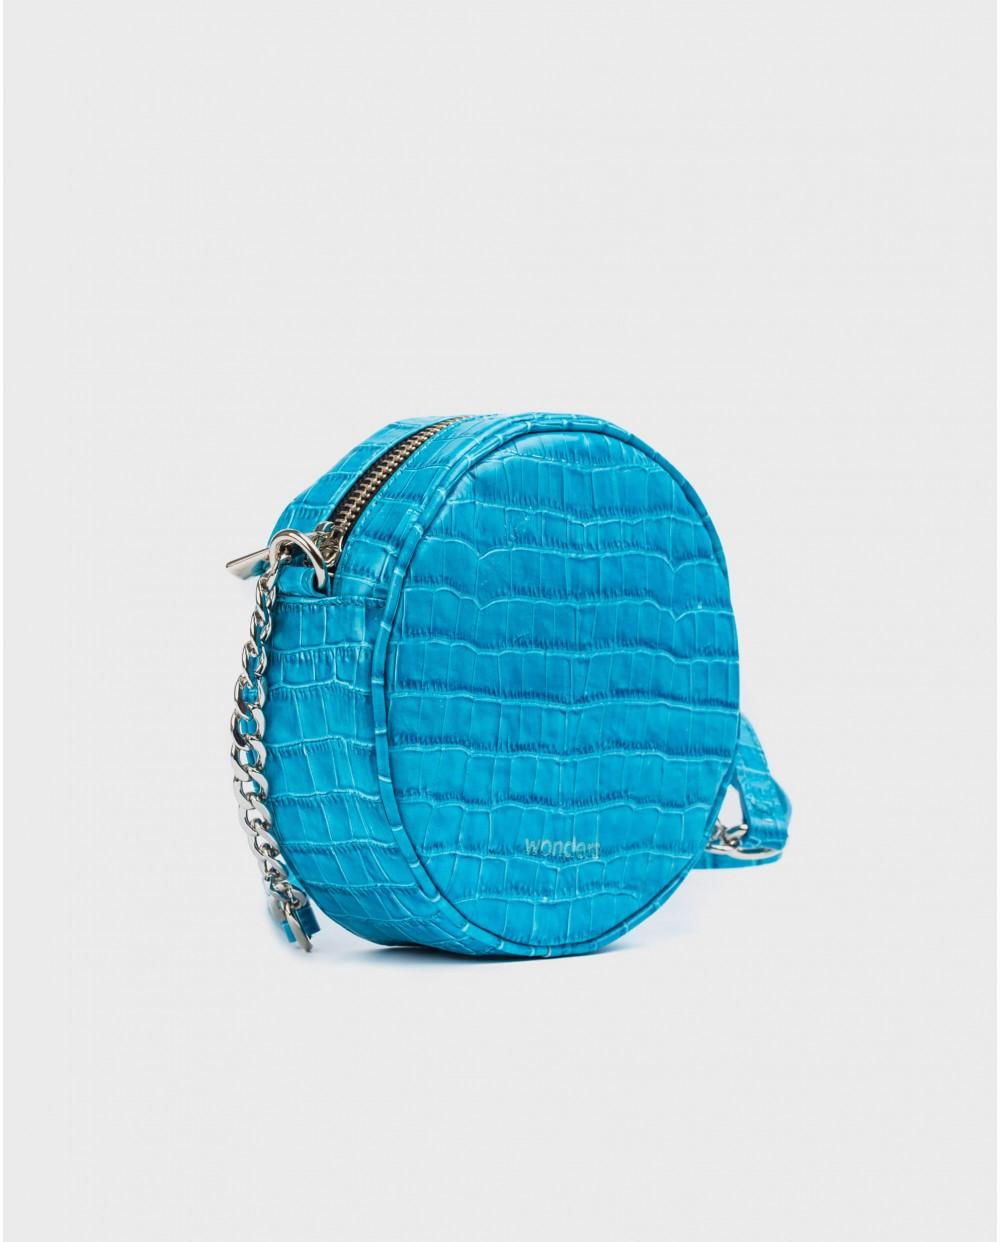 Wonders-Bags-Circular handbag with crossbody strap